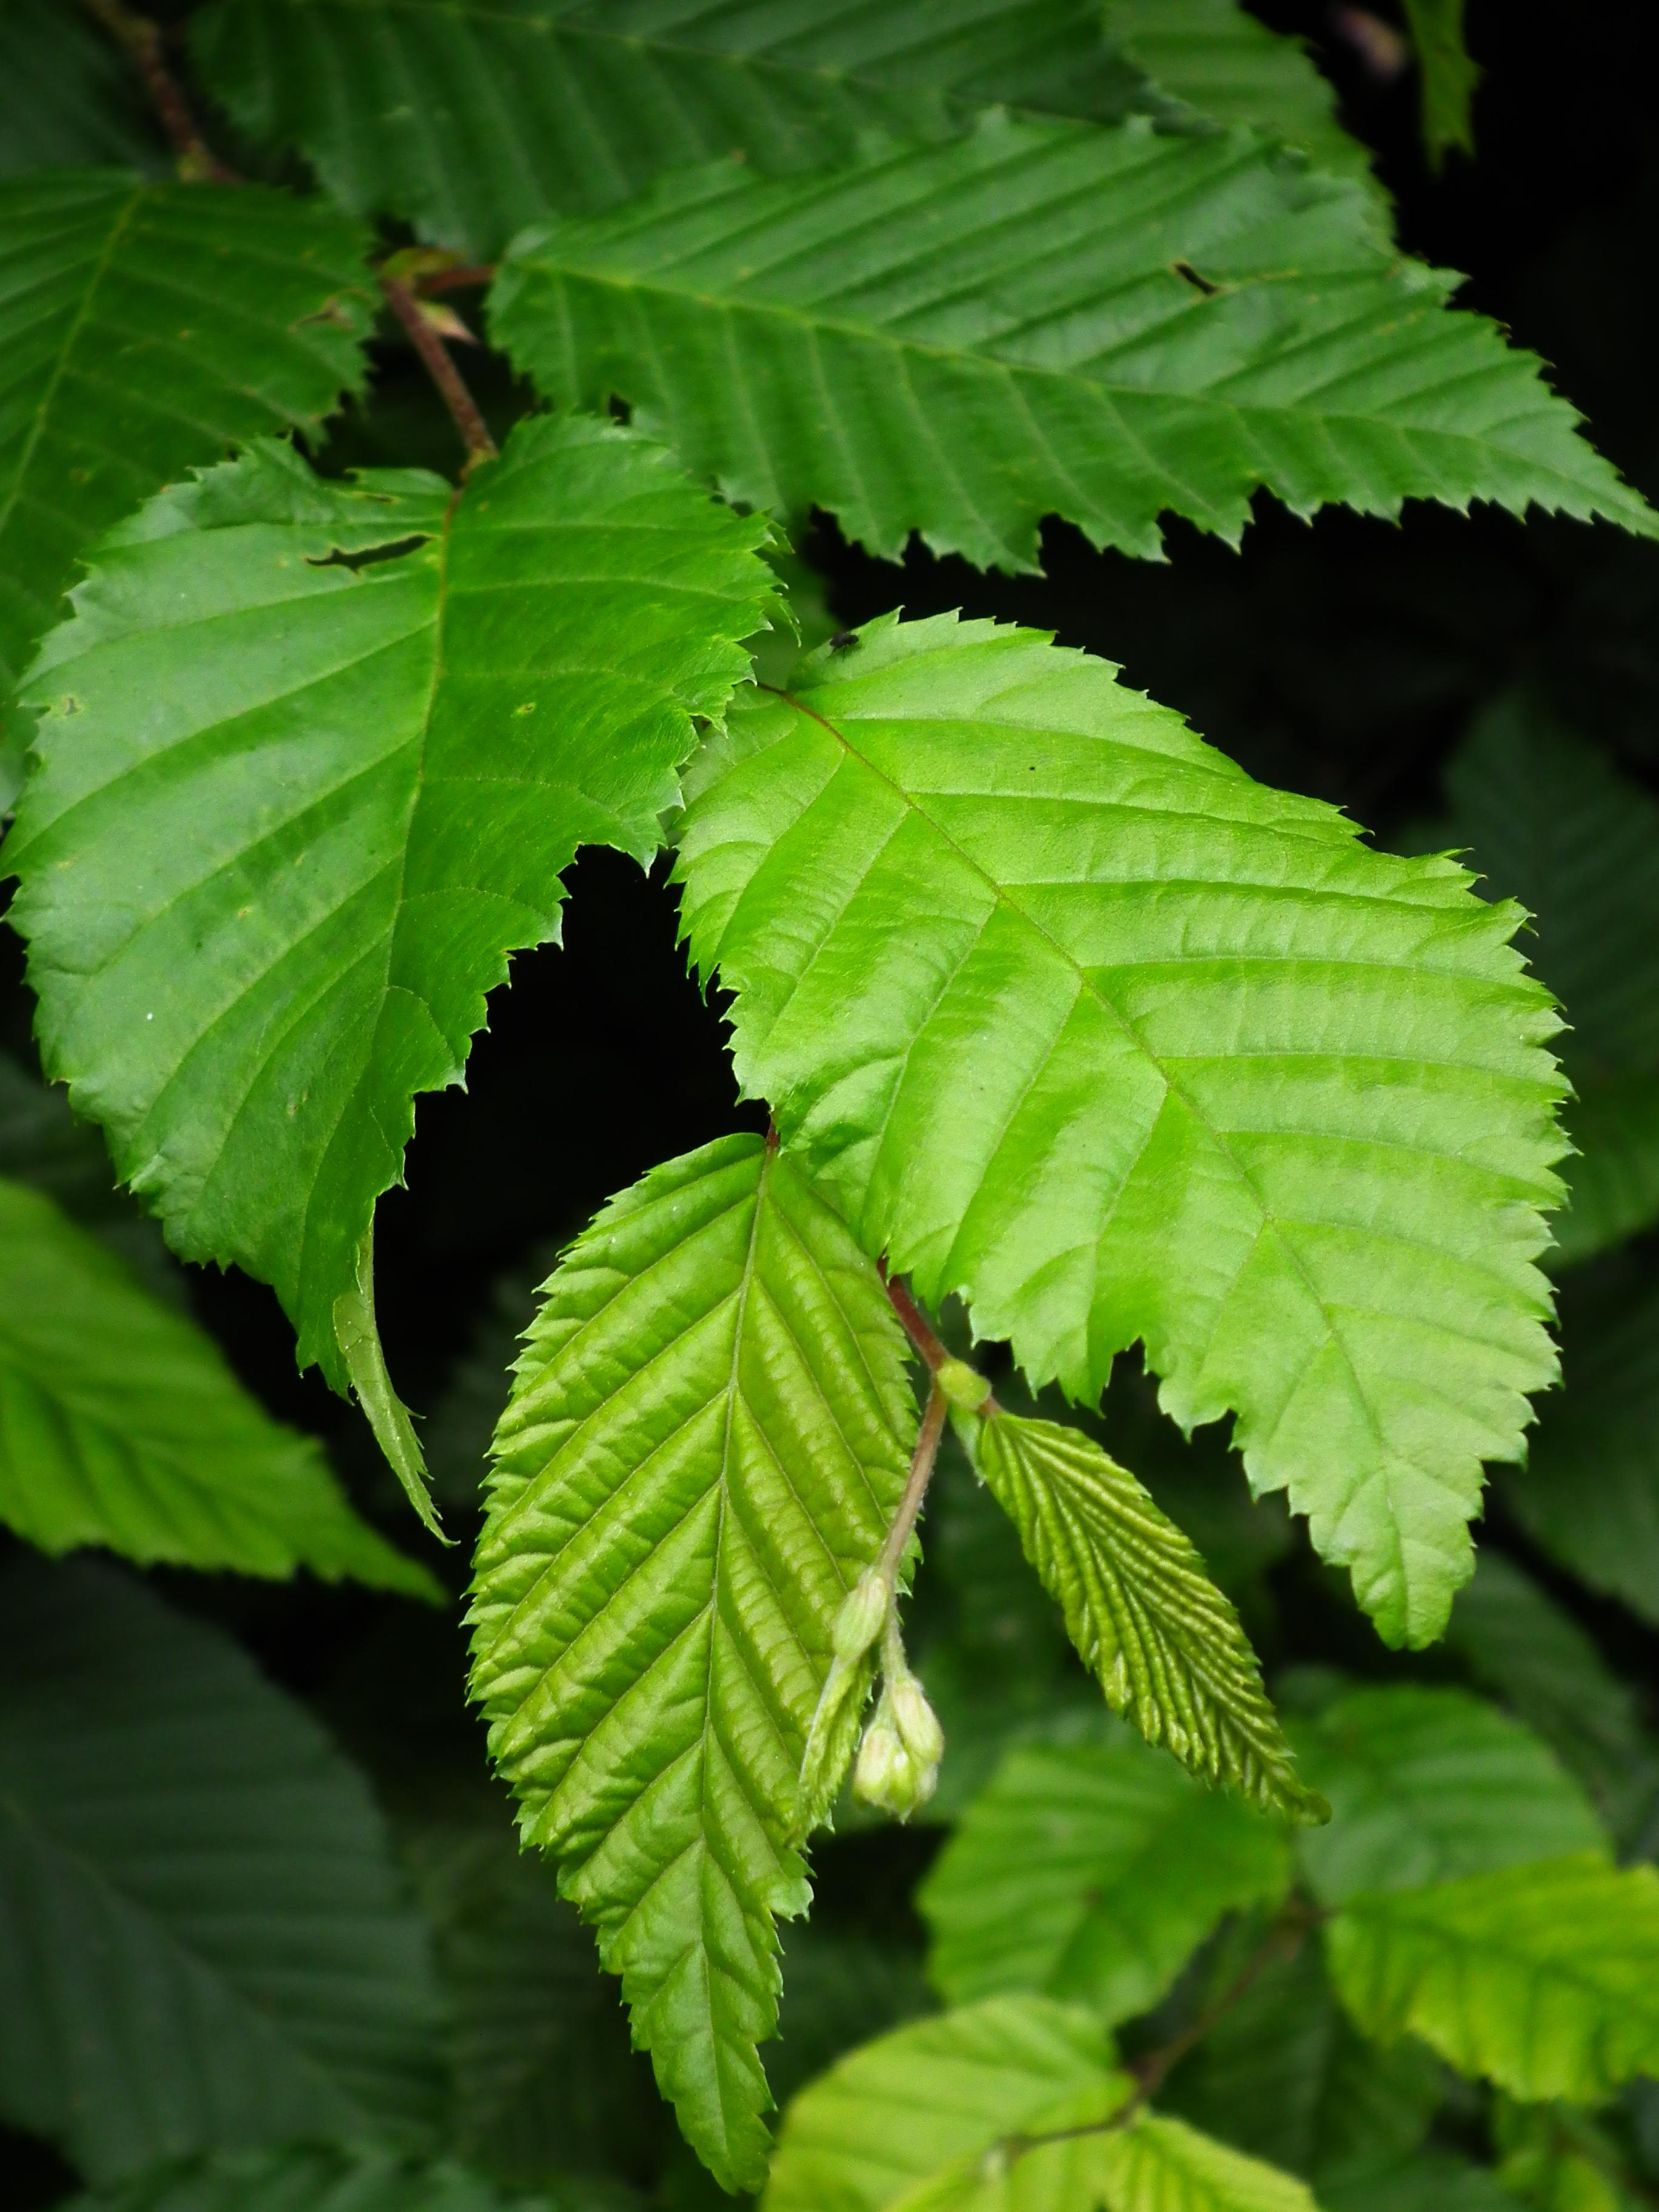 file hainbuche carpinus betulus fulda juni 2012 jpg wikimedia commons. Black Bedroom Furniture Sets. Home Design Ideas